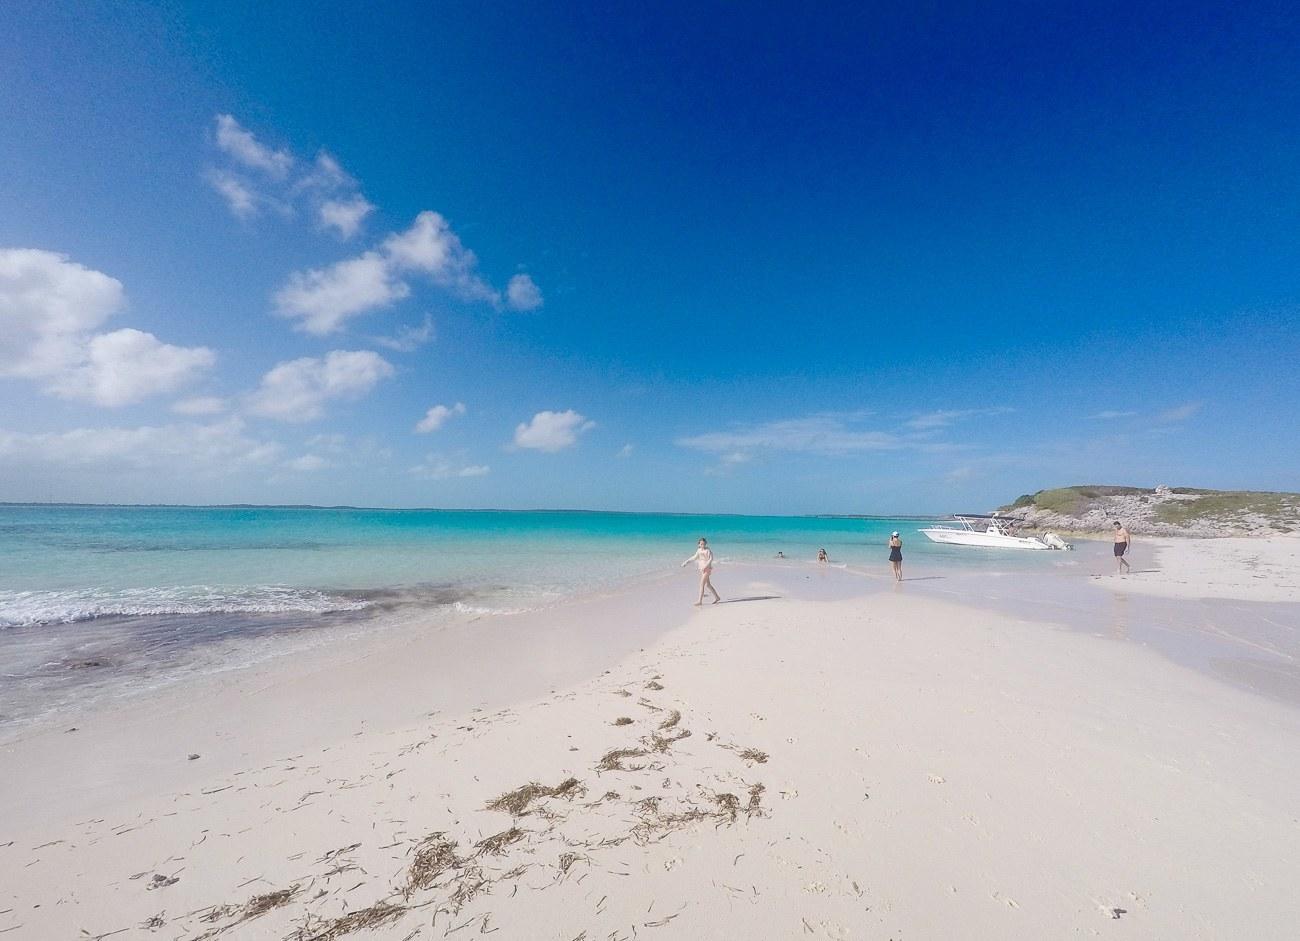 Gorgeous white sand beaches in the Exumas as seen during our swimming pigs tour.